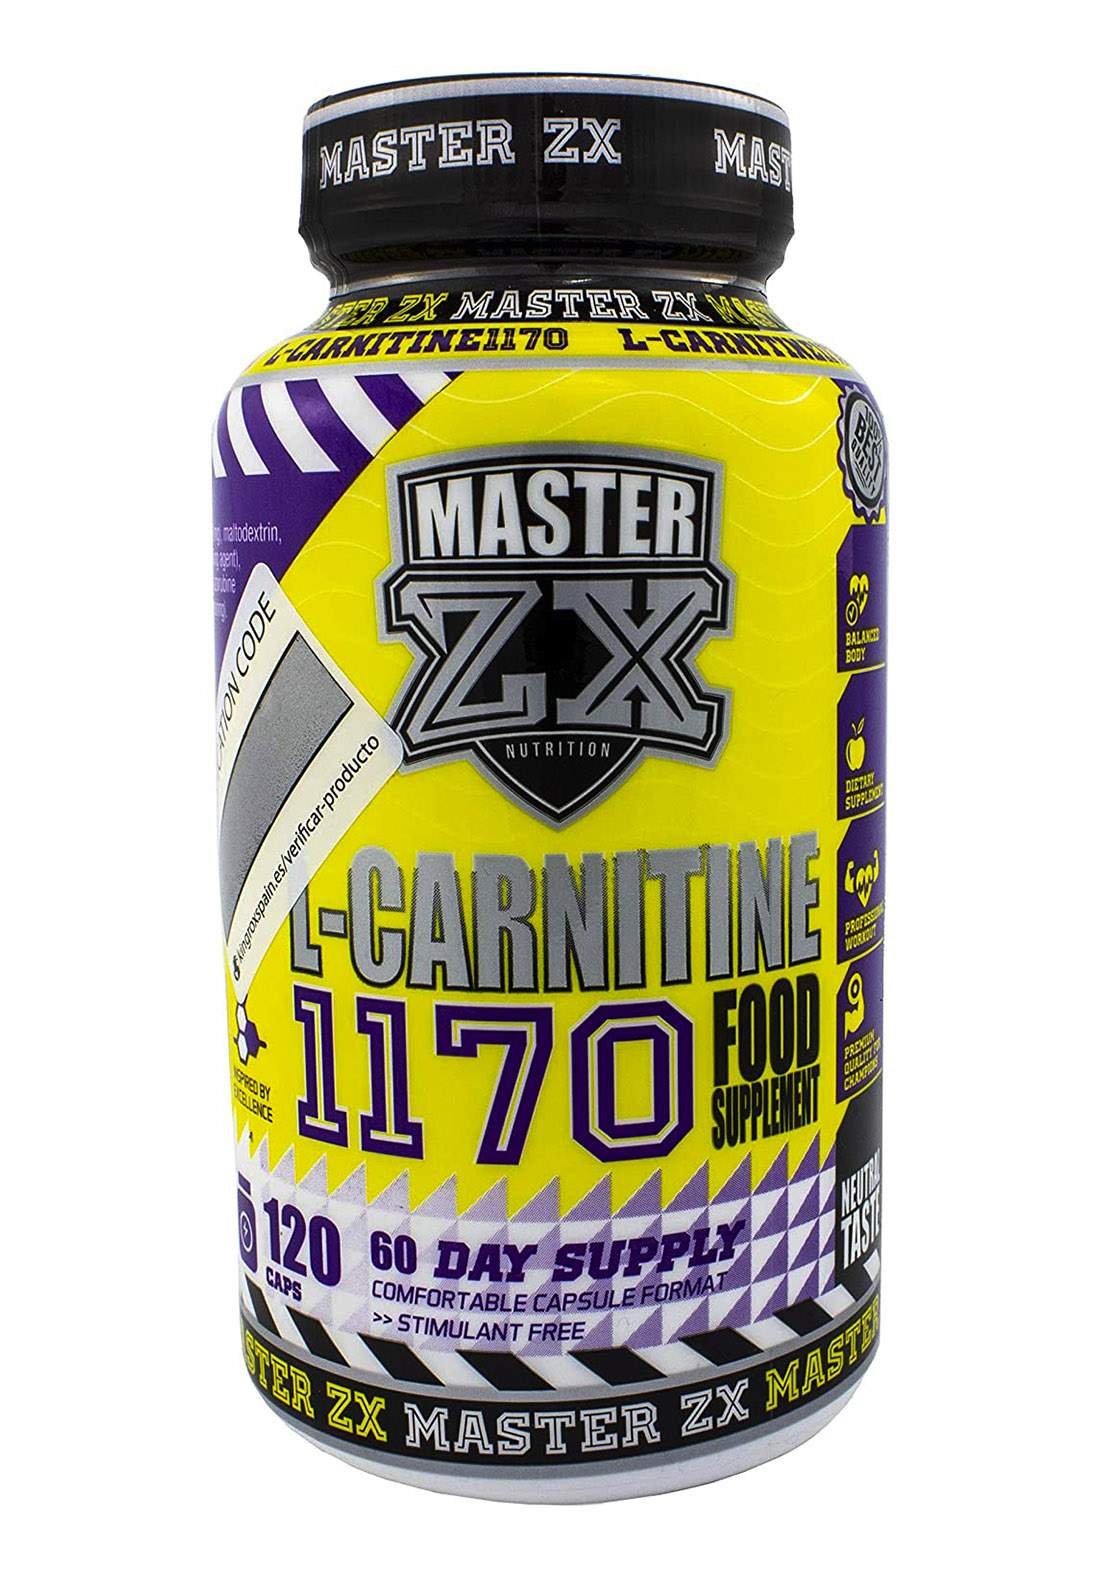 Master ZX L-CARNITINA - 120 Caps 100g - Por 1cap مكمل غذائي